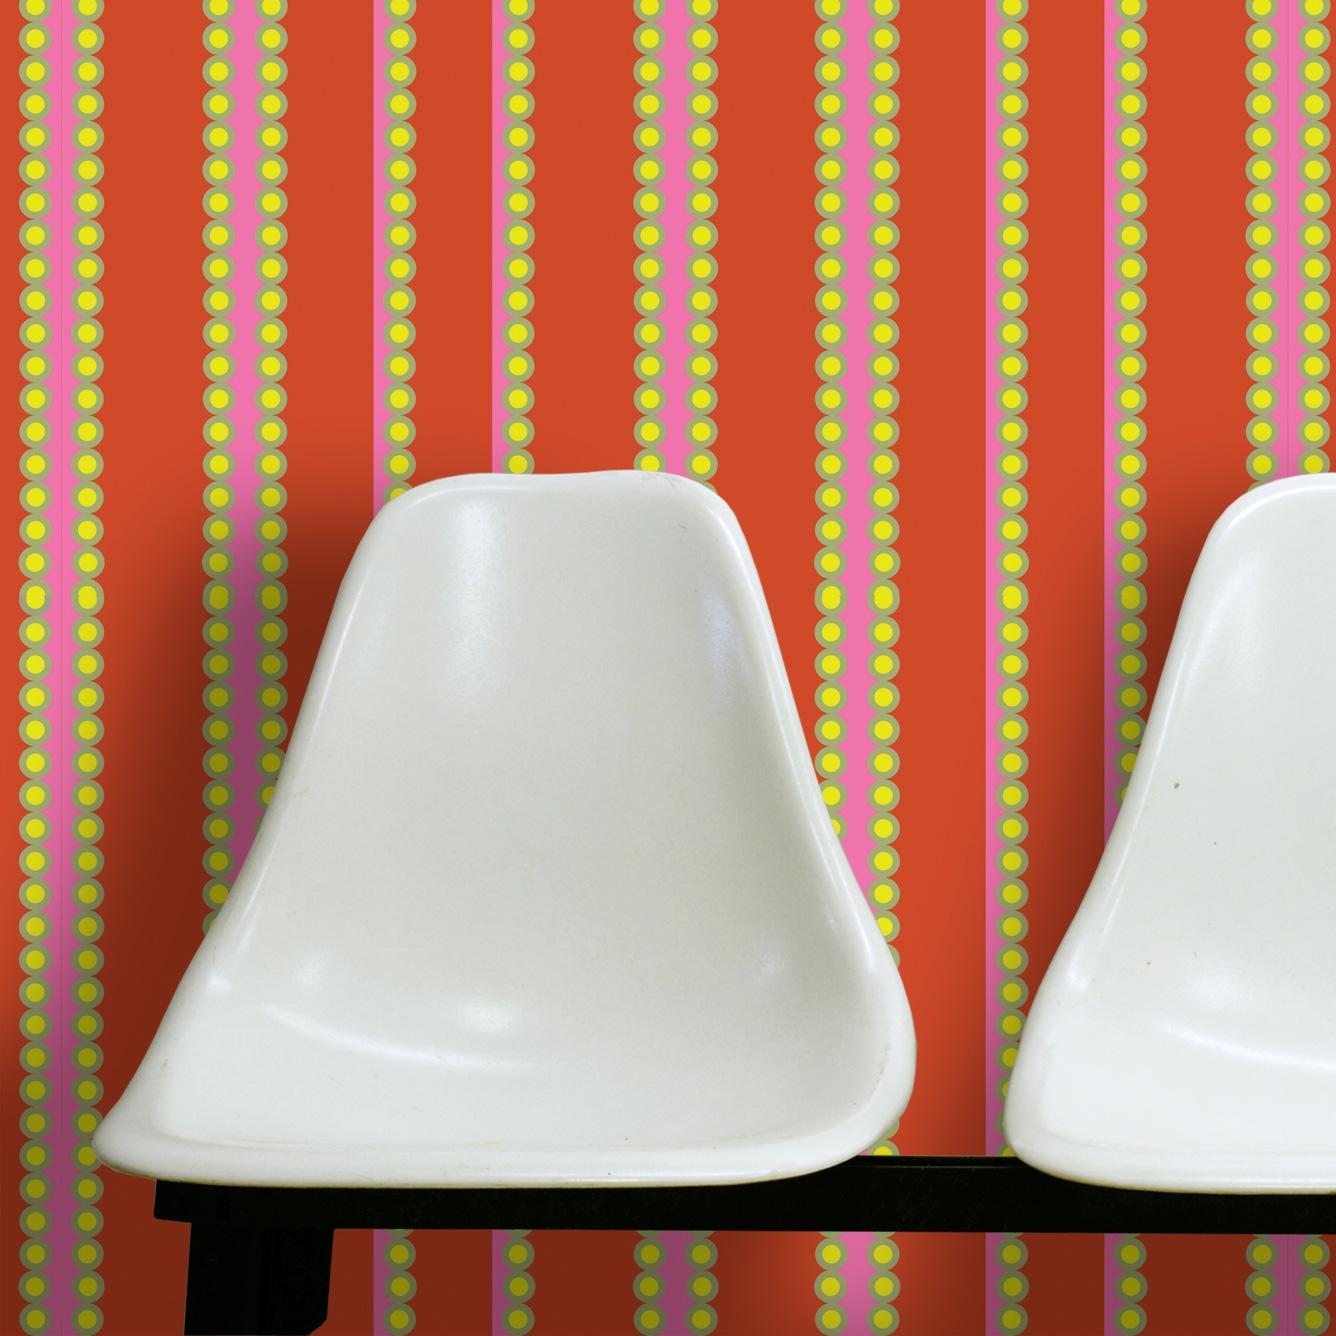 White-Fiberglass-Chairs-FELIX-red.jpg